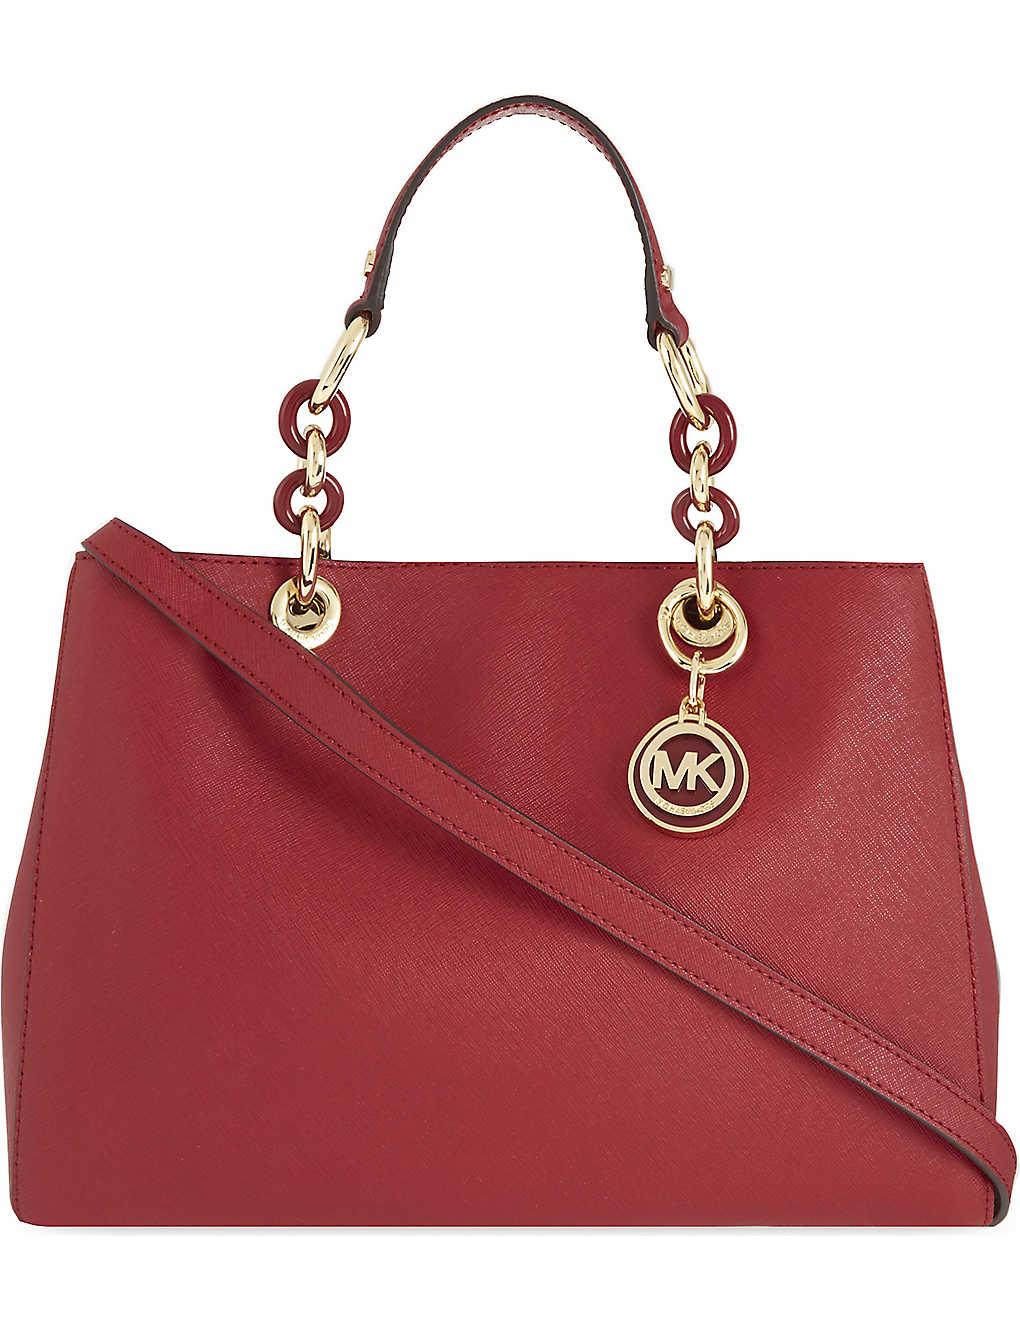 525c722802fd7 MICHAEL MICHAEL KORS - Cynthia medium Saffiano leather satchel ...